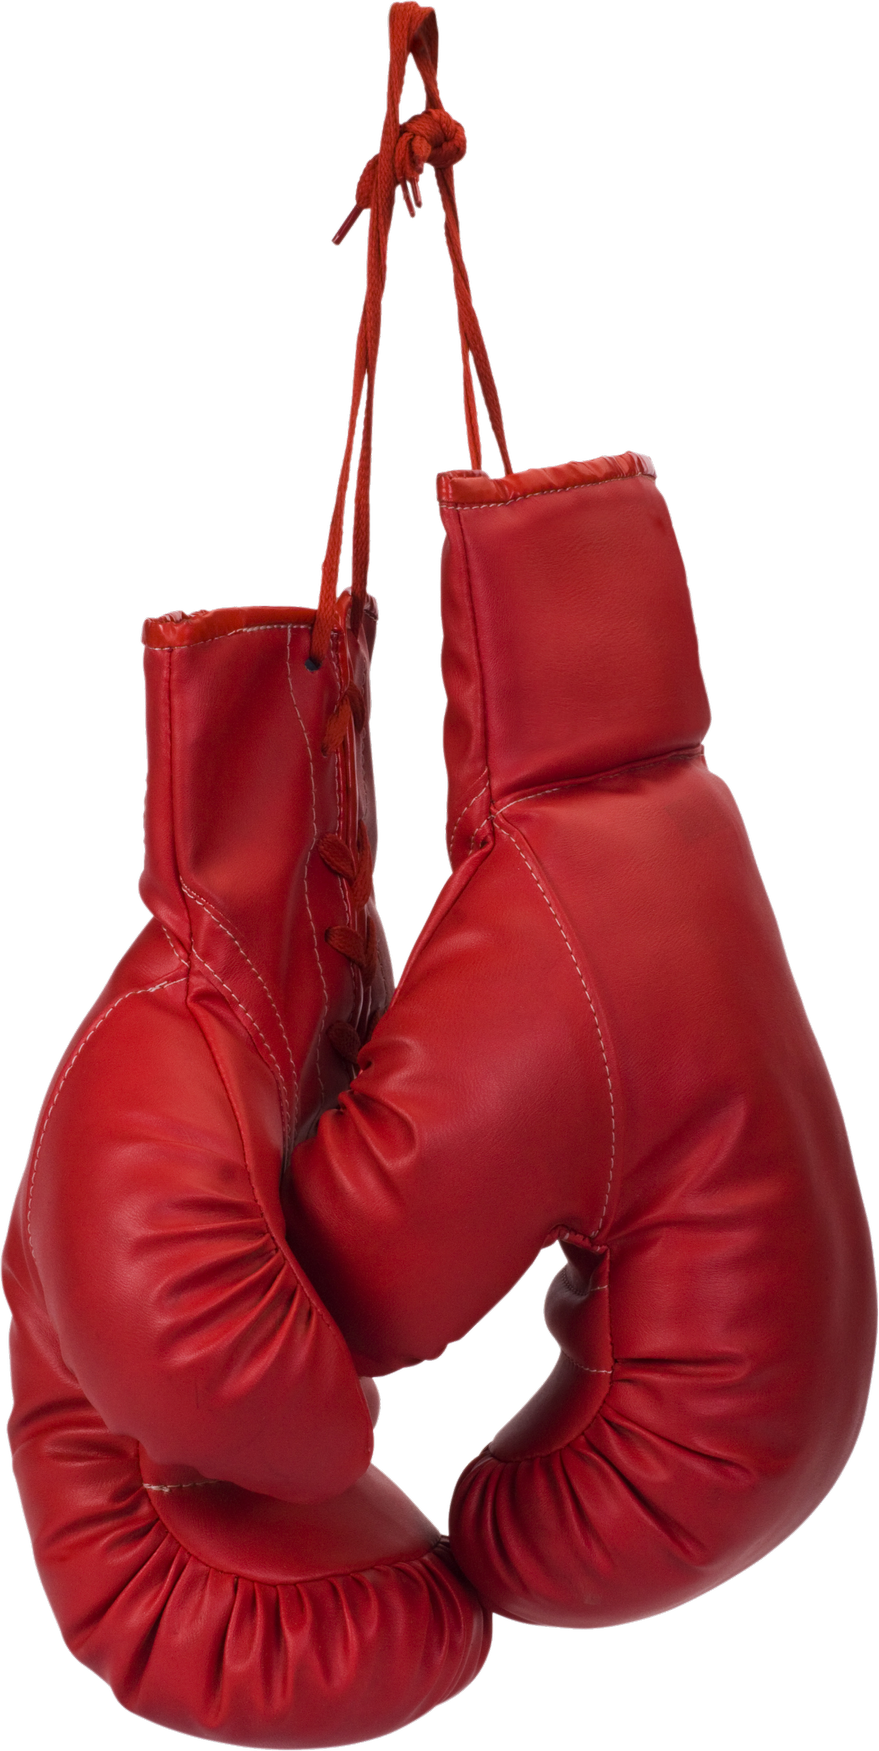 Boxing Glove Png Image Gloves Boxing Gloves Boxing Gloves Art